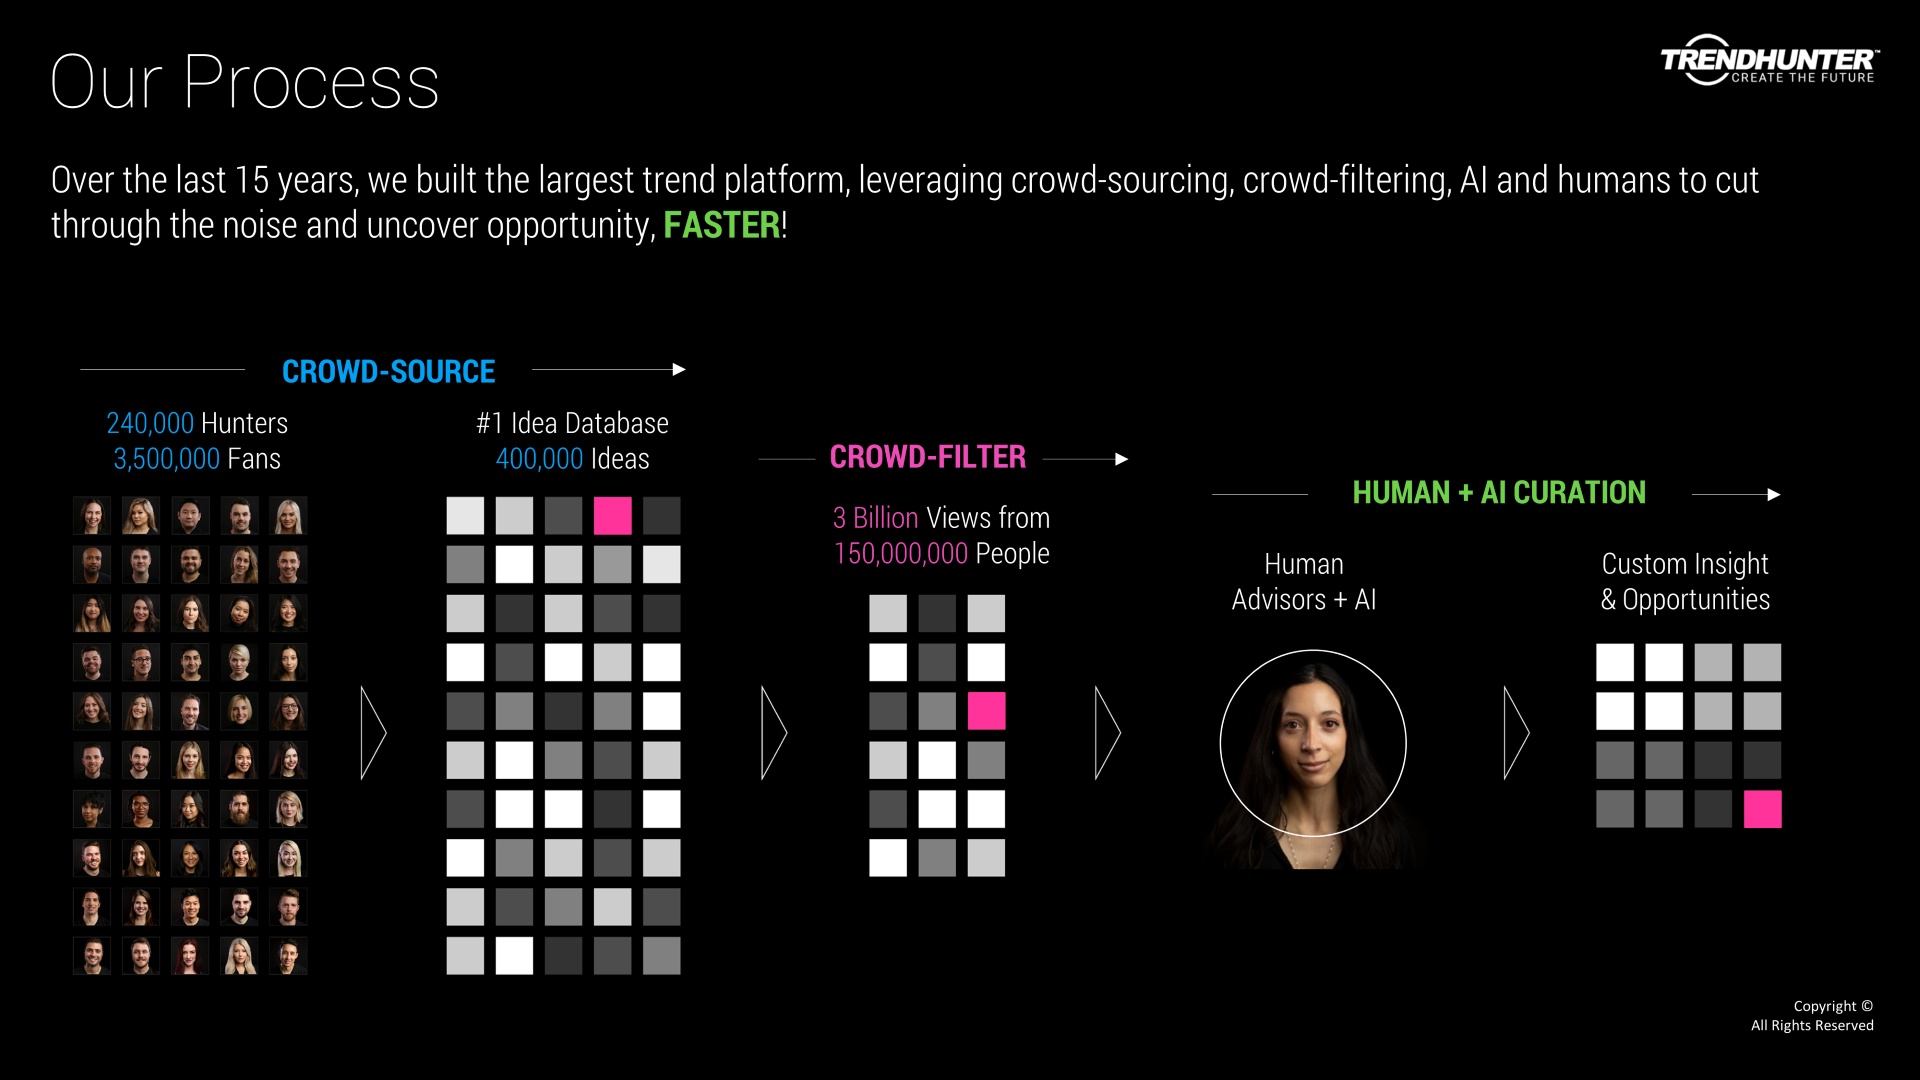 Image Slide: Trend Hunter content filtering process